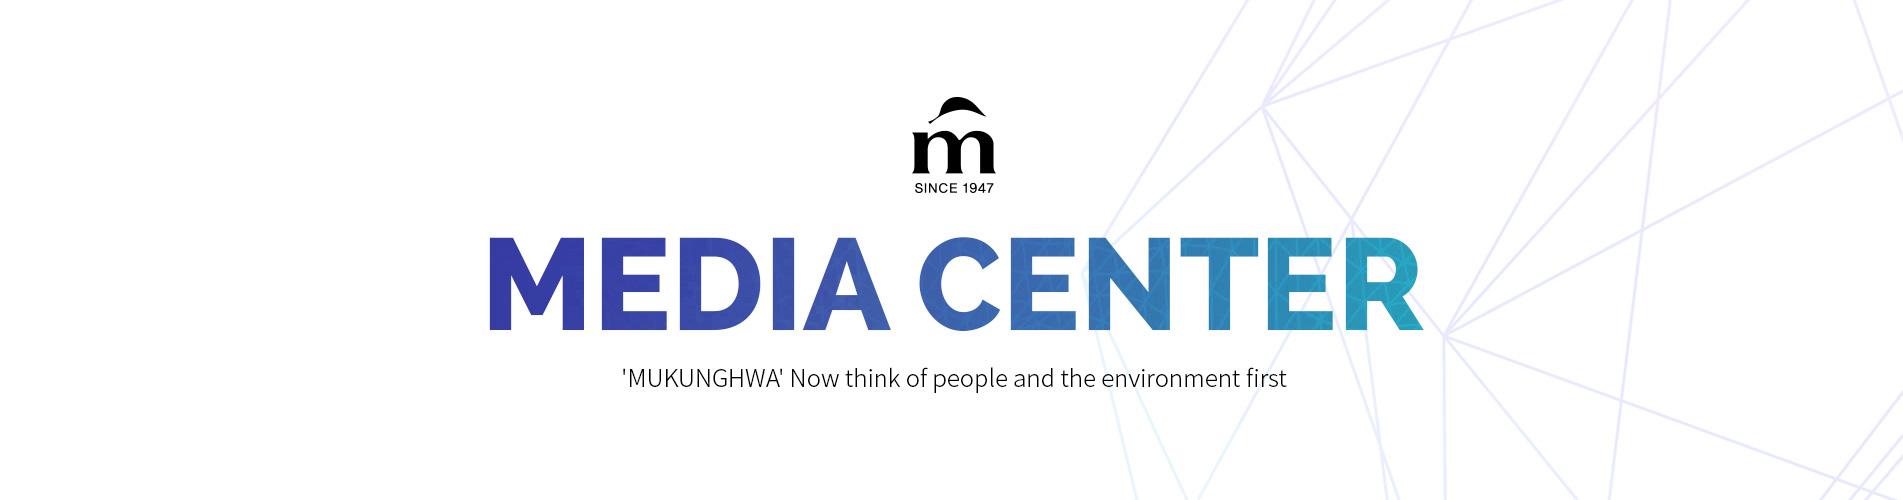 mediacenter-top